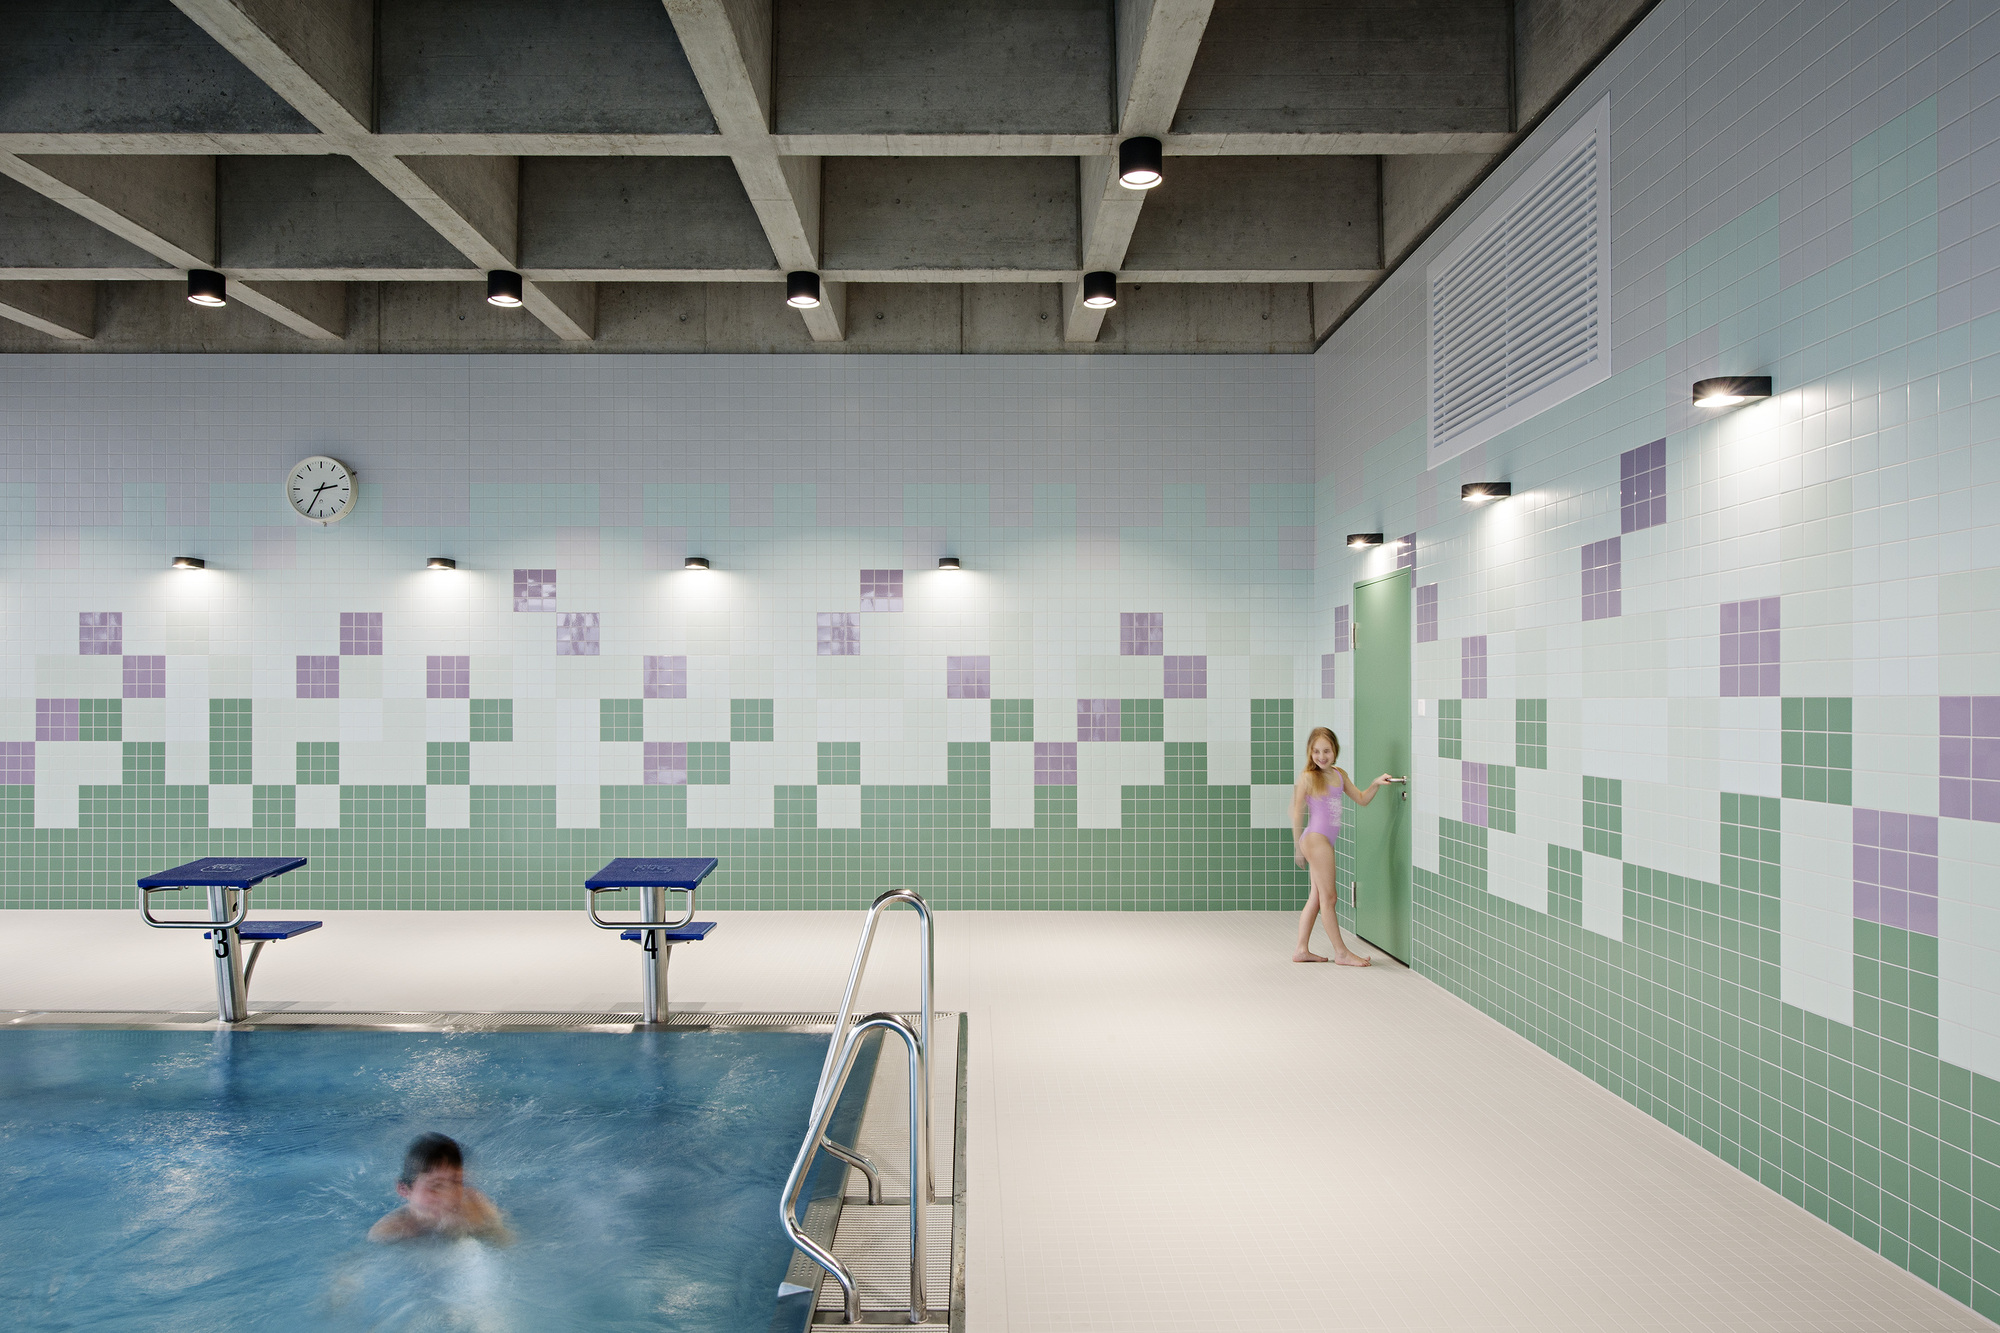 Gallery of Swimming Pool Allmendli  illiz Architektur  16